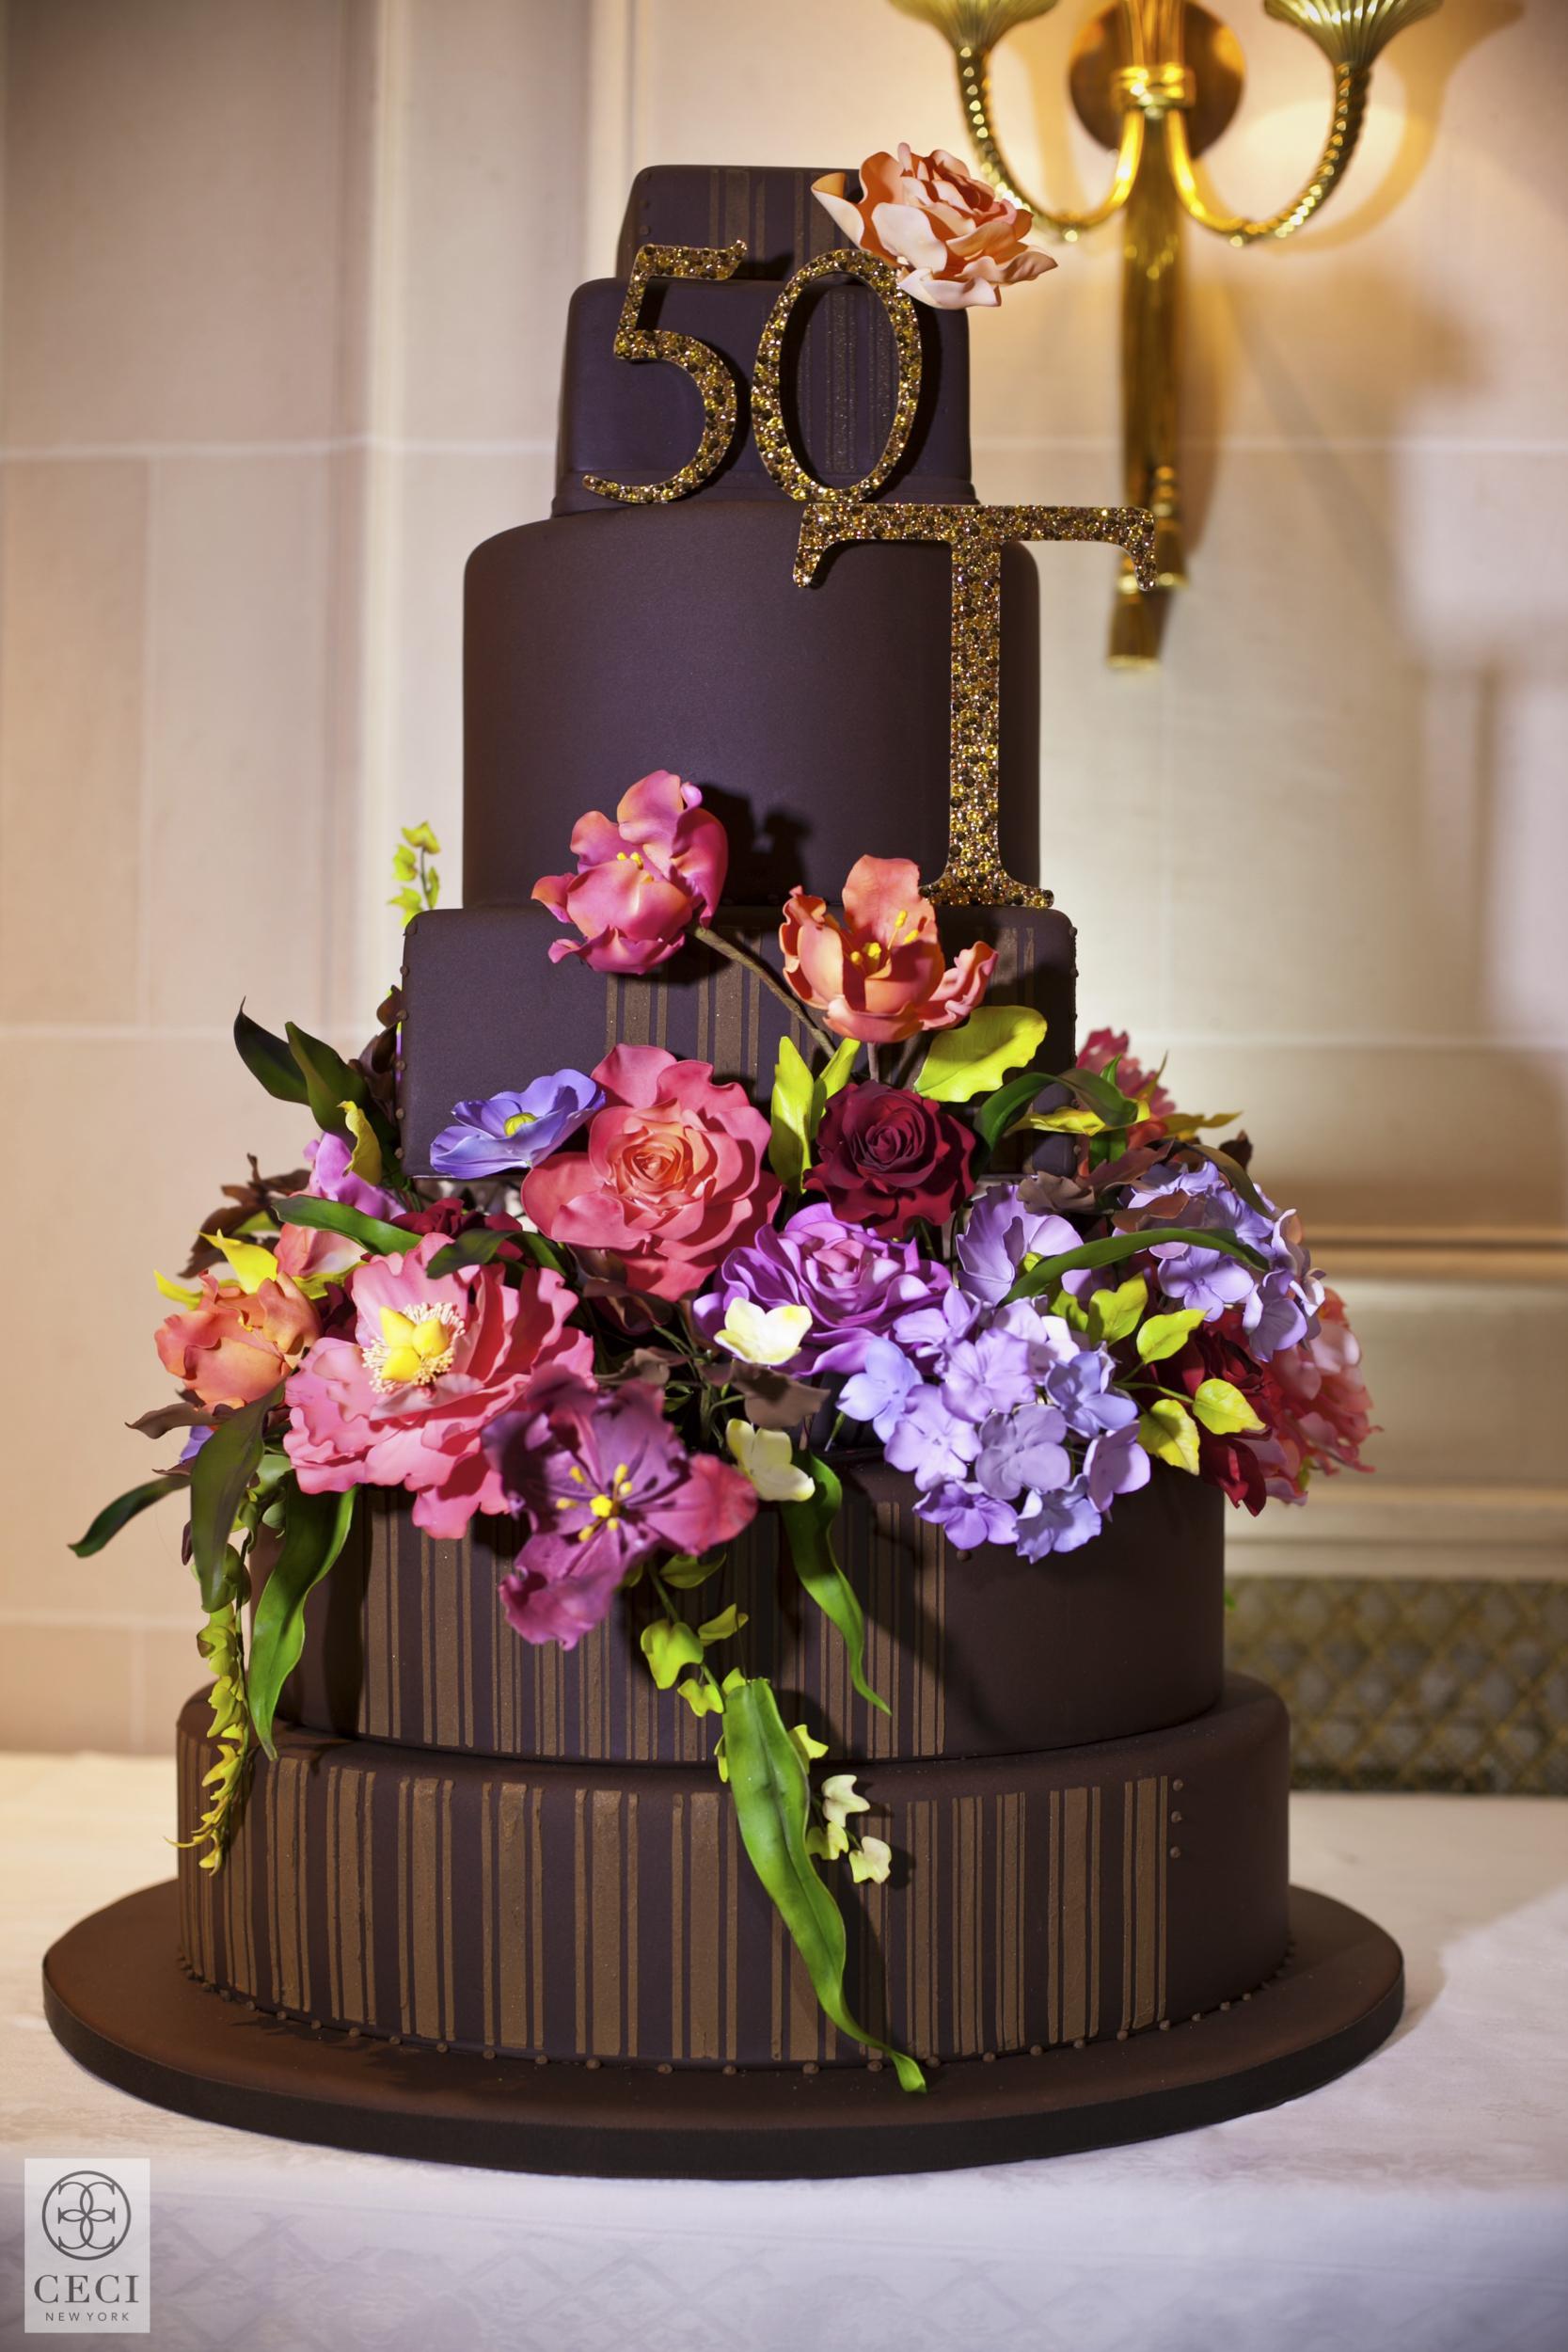 ceci_new_york_lucas_somoza_purple_regal_wediding_birthday_commitment_ceremony_gold-35.jpg